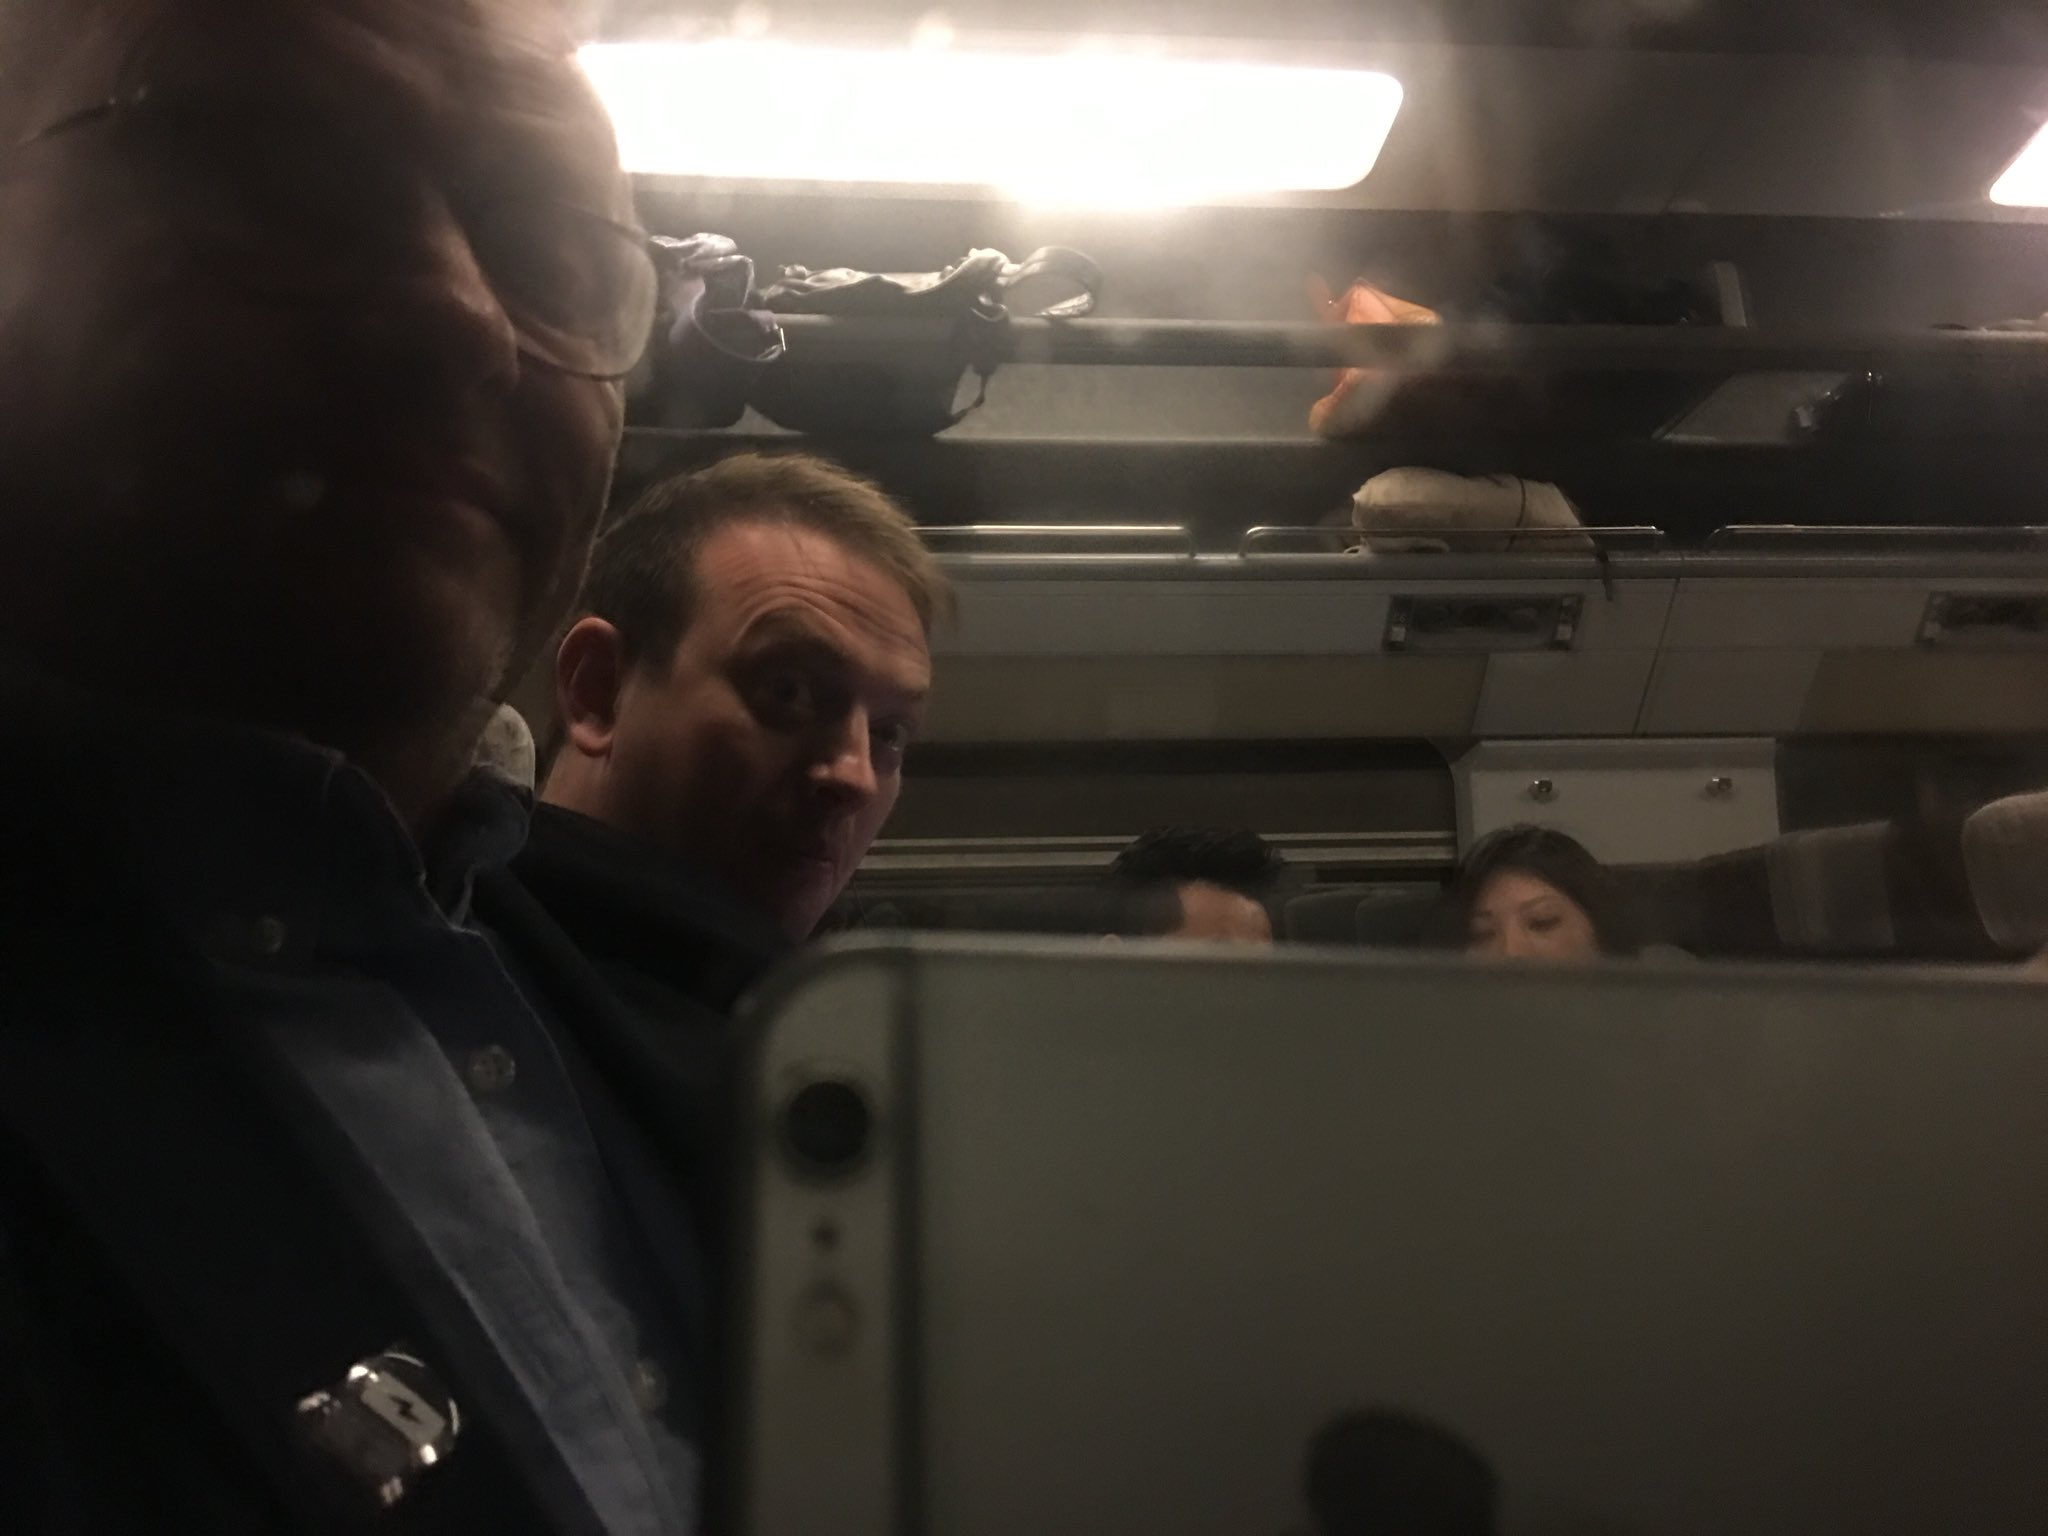 Full 4G signal under La Manche. #eurotunnel https://t.co/sSgzMLAwuG